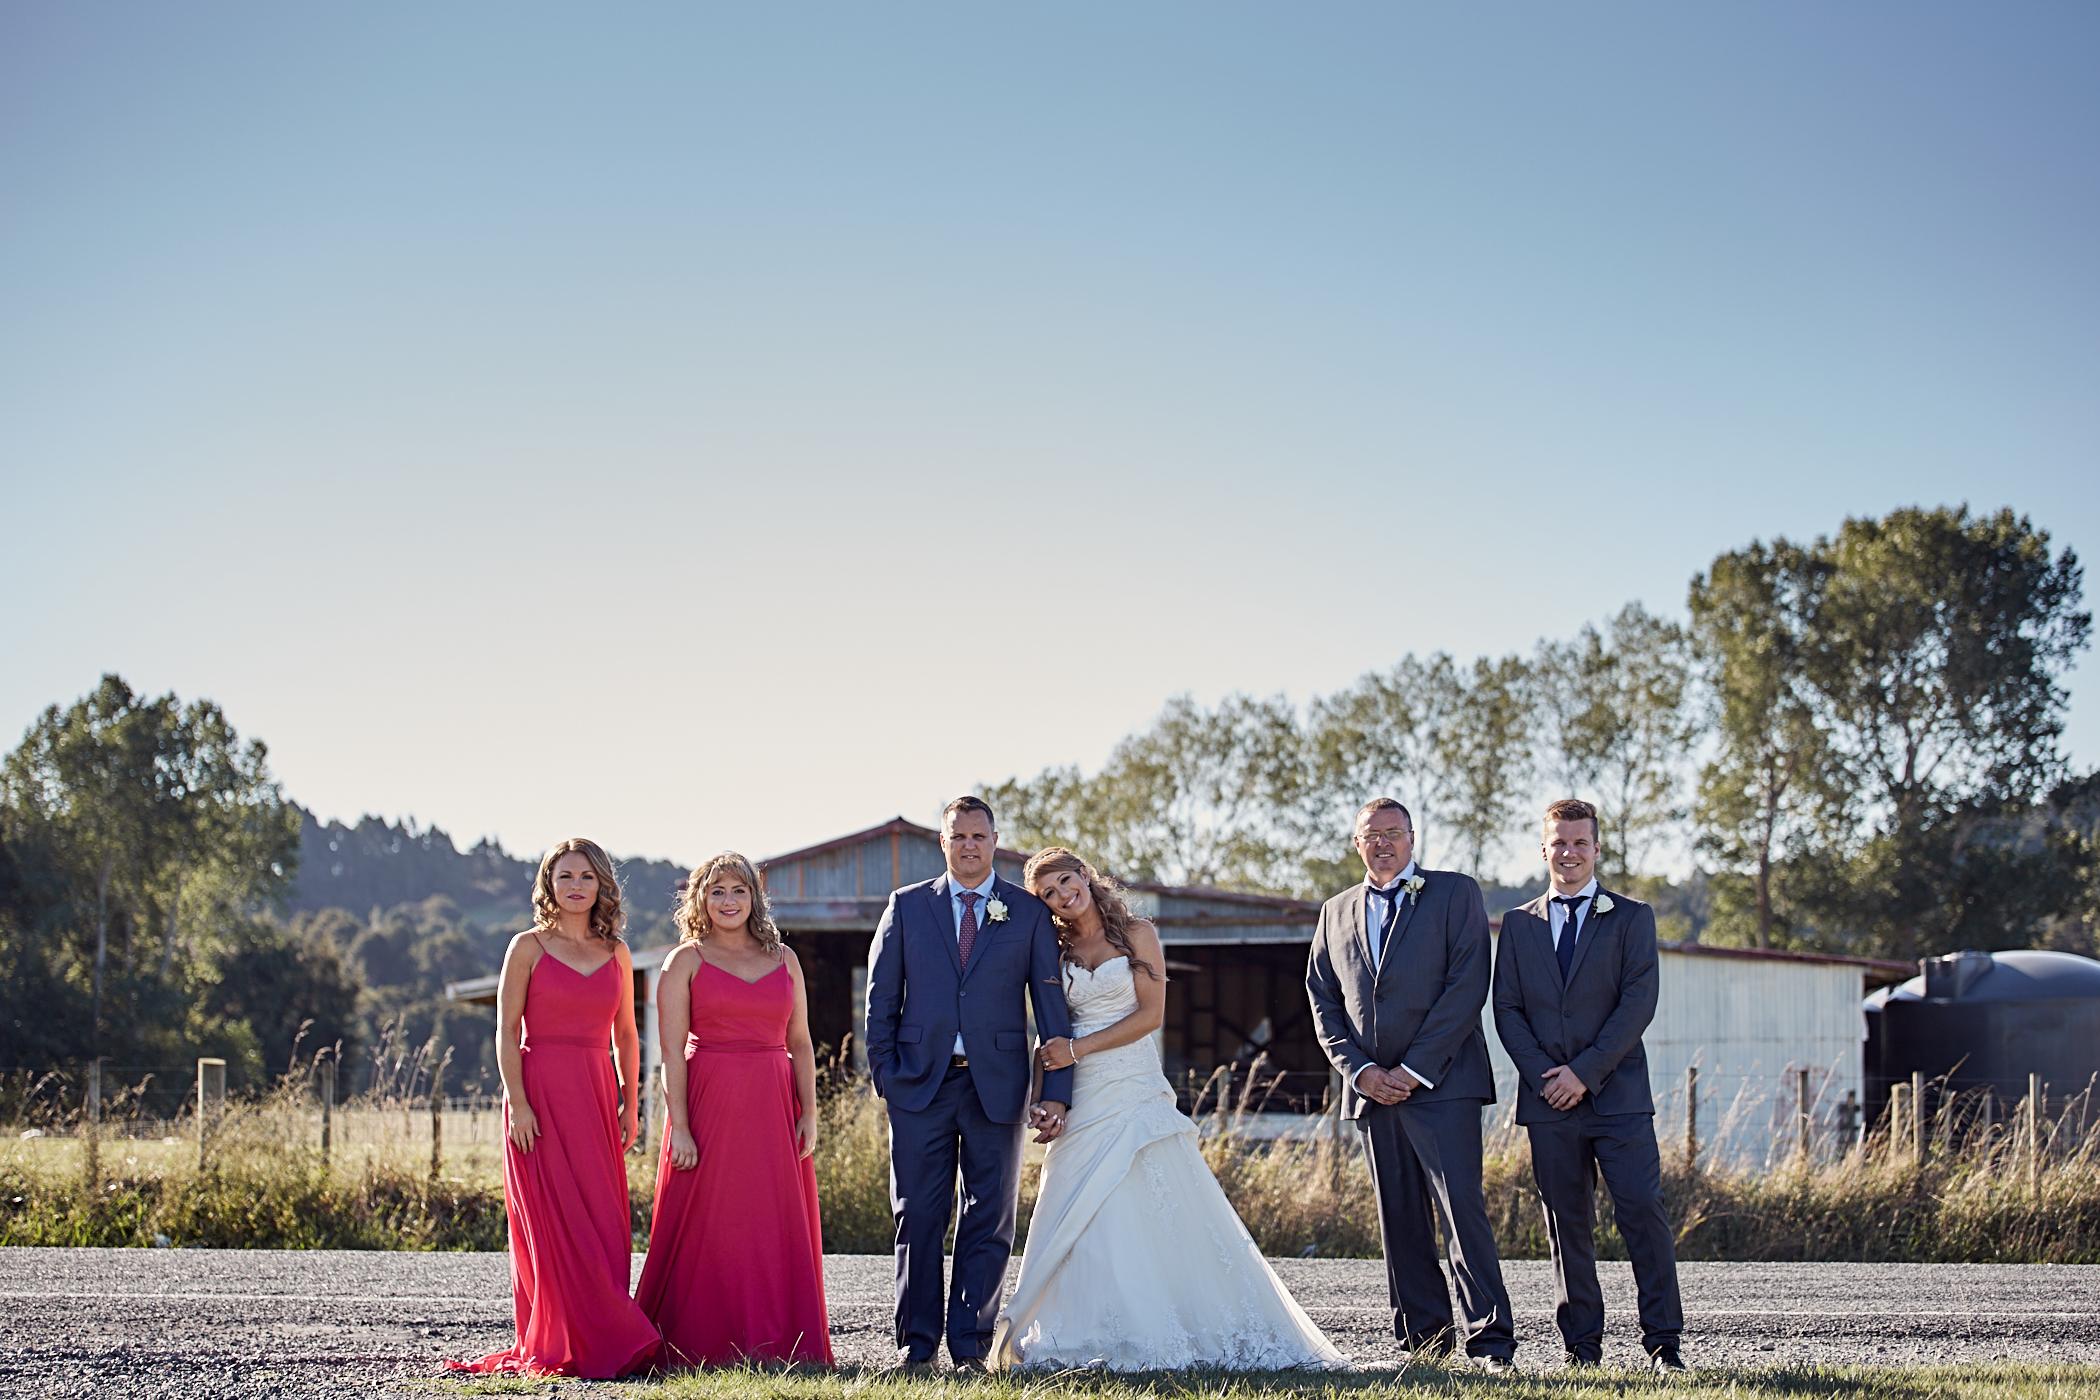 Wedding pose on road